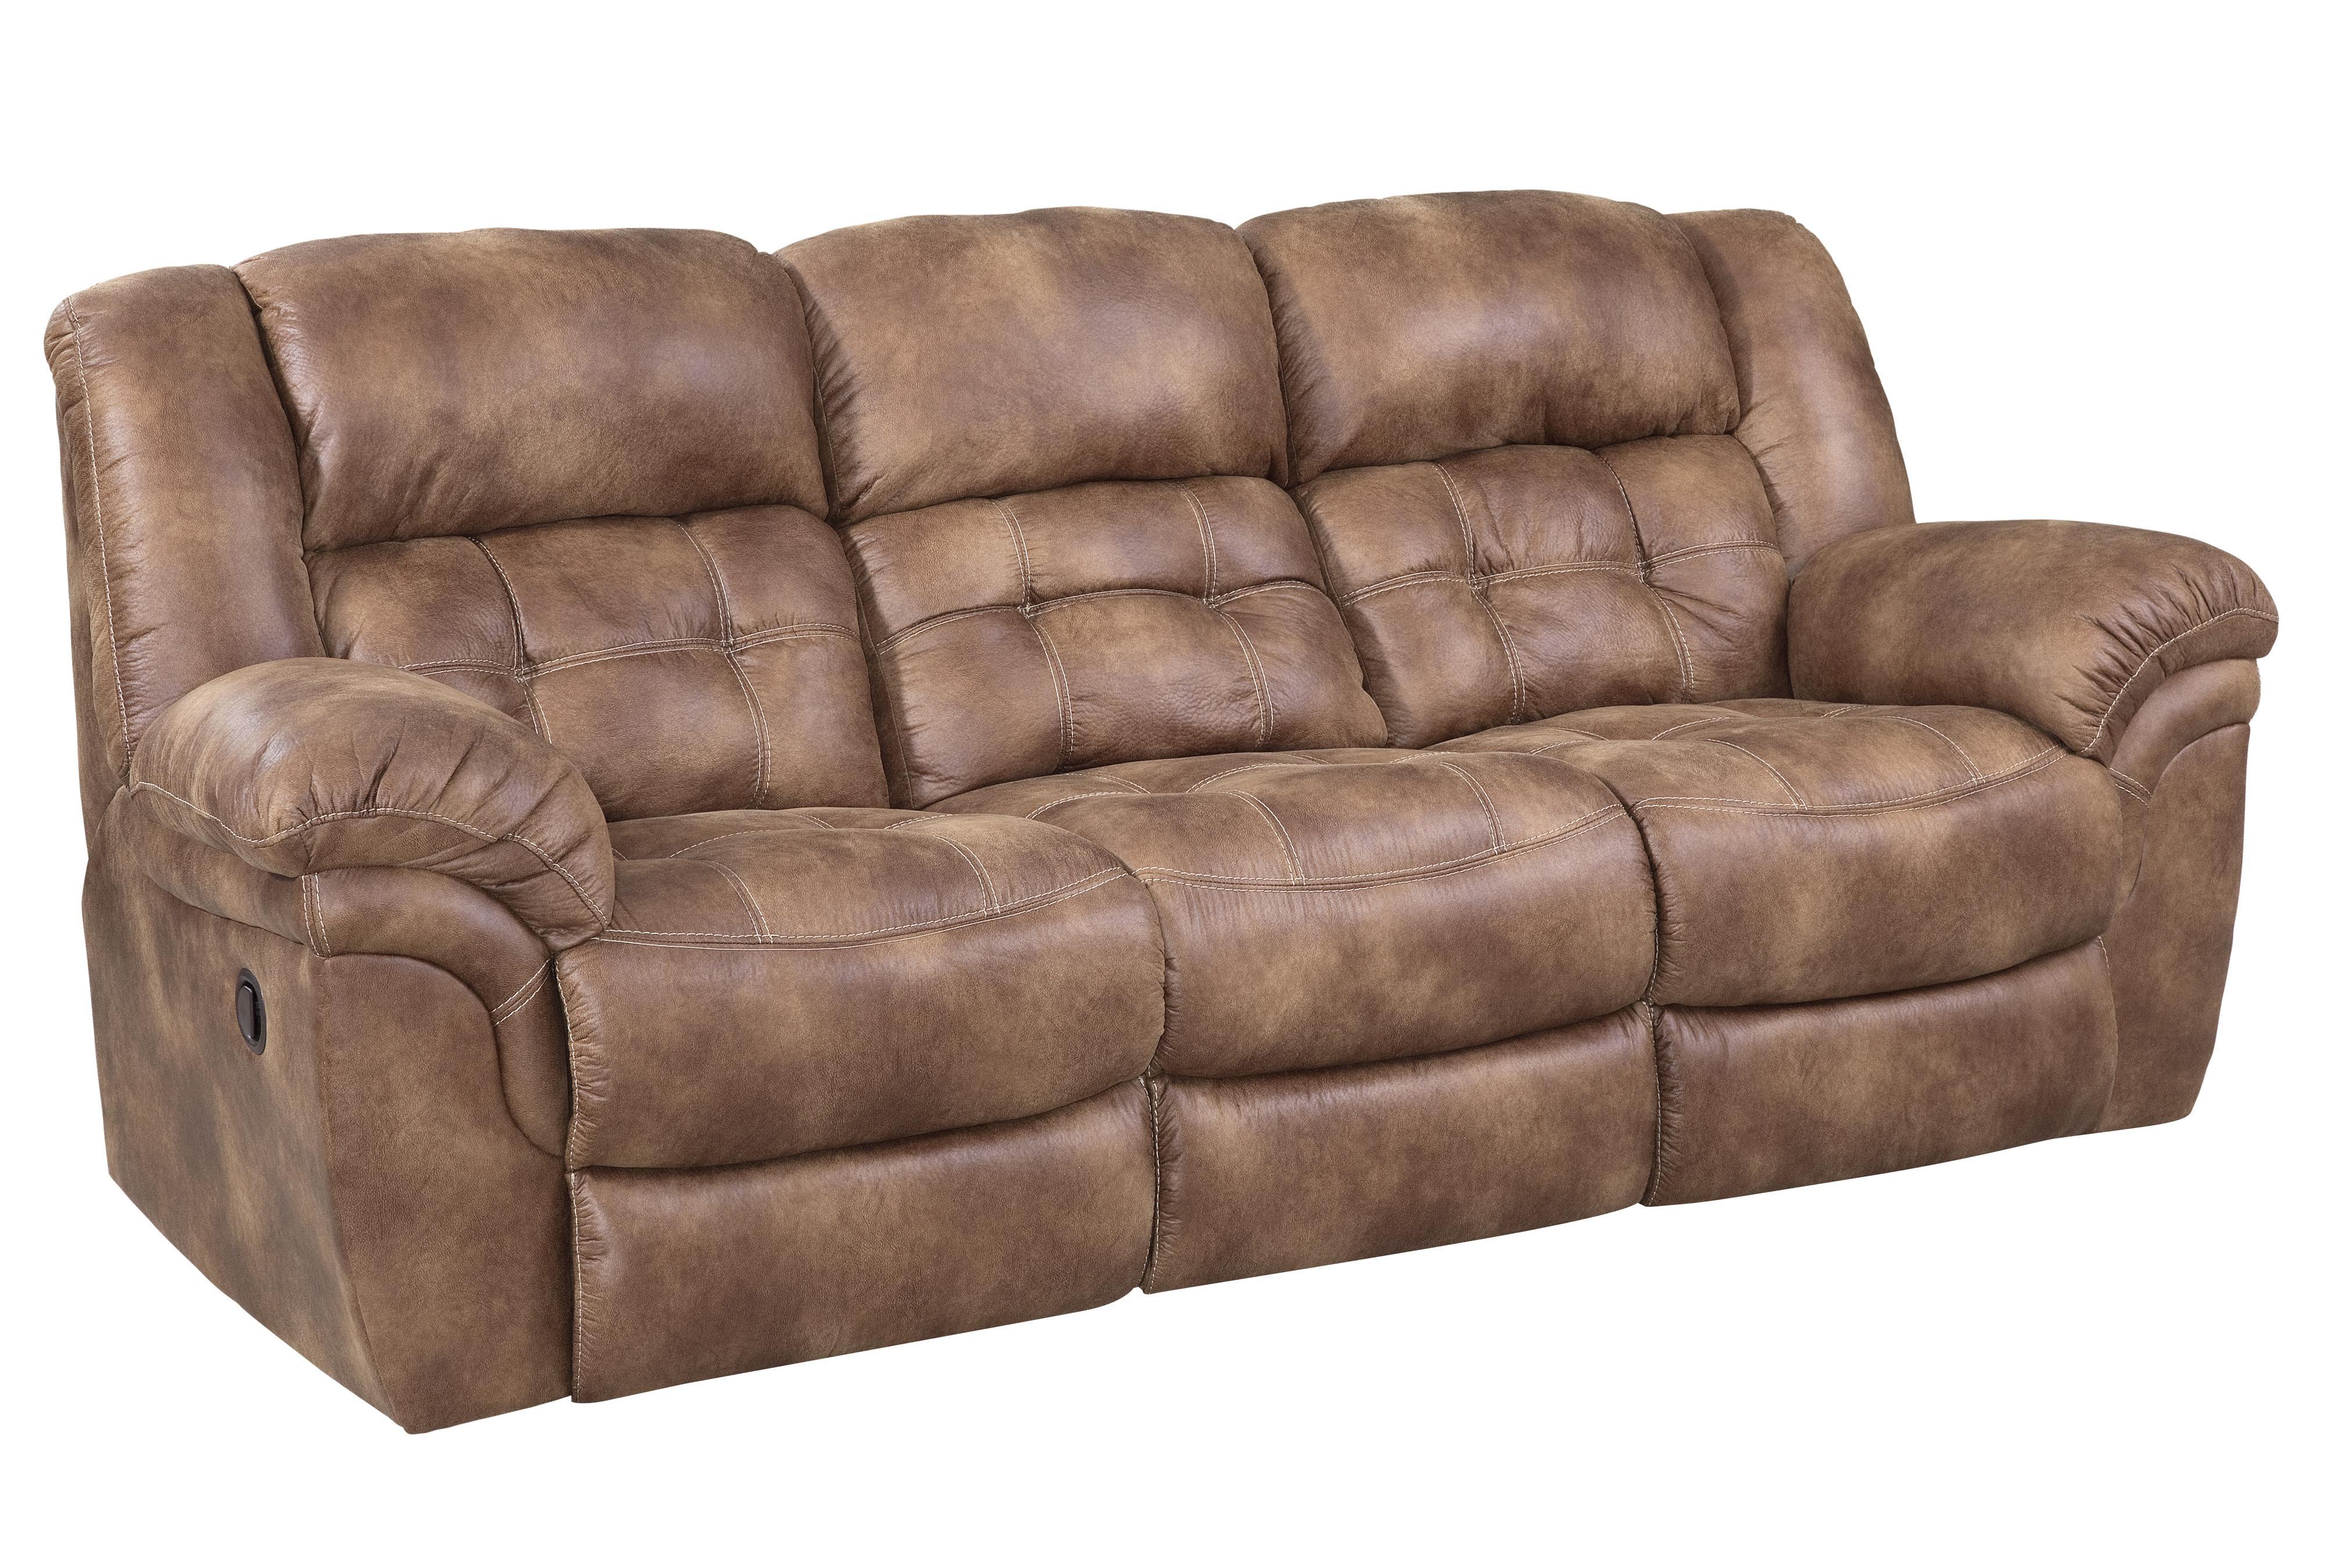 homestretch 129 casual reclining sofa johnny janosik reclining sofas. Black Bedroom Furniture Sets. Home Design Ideas